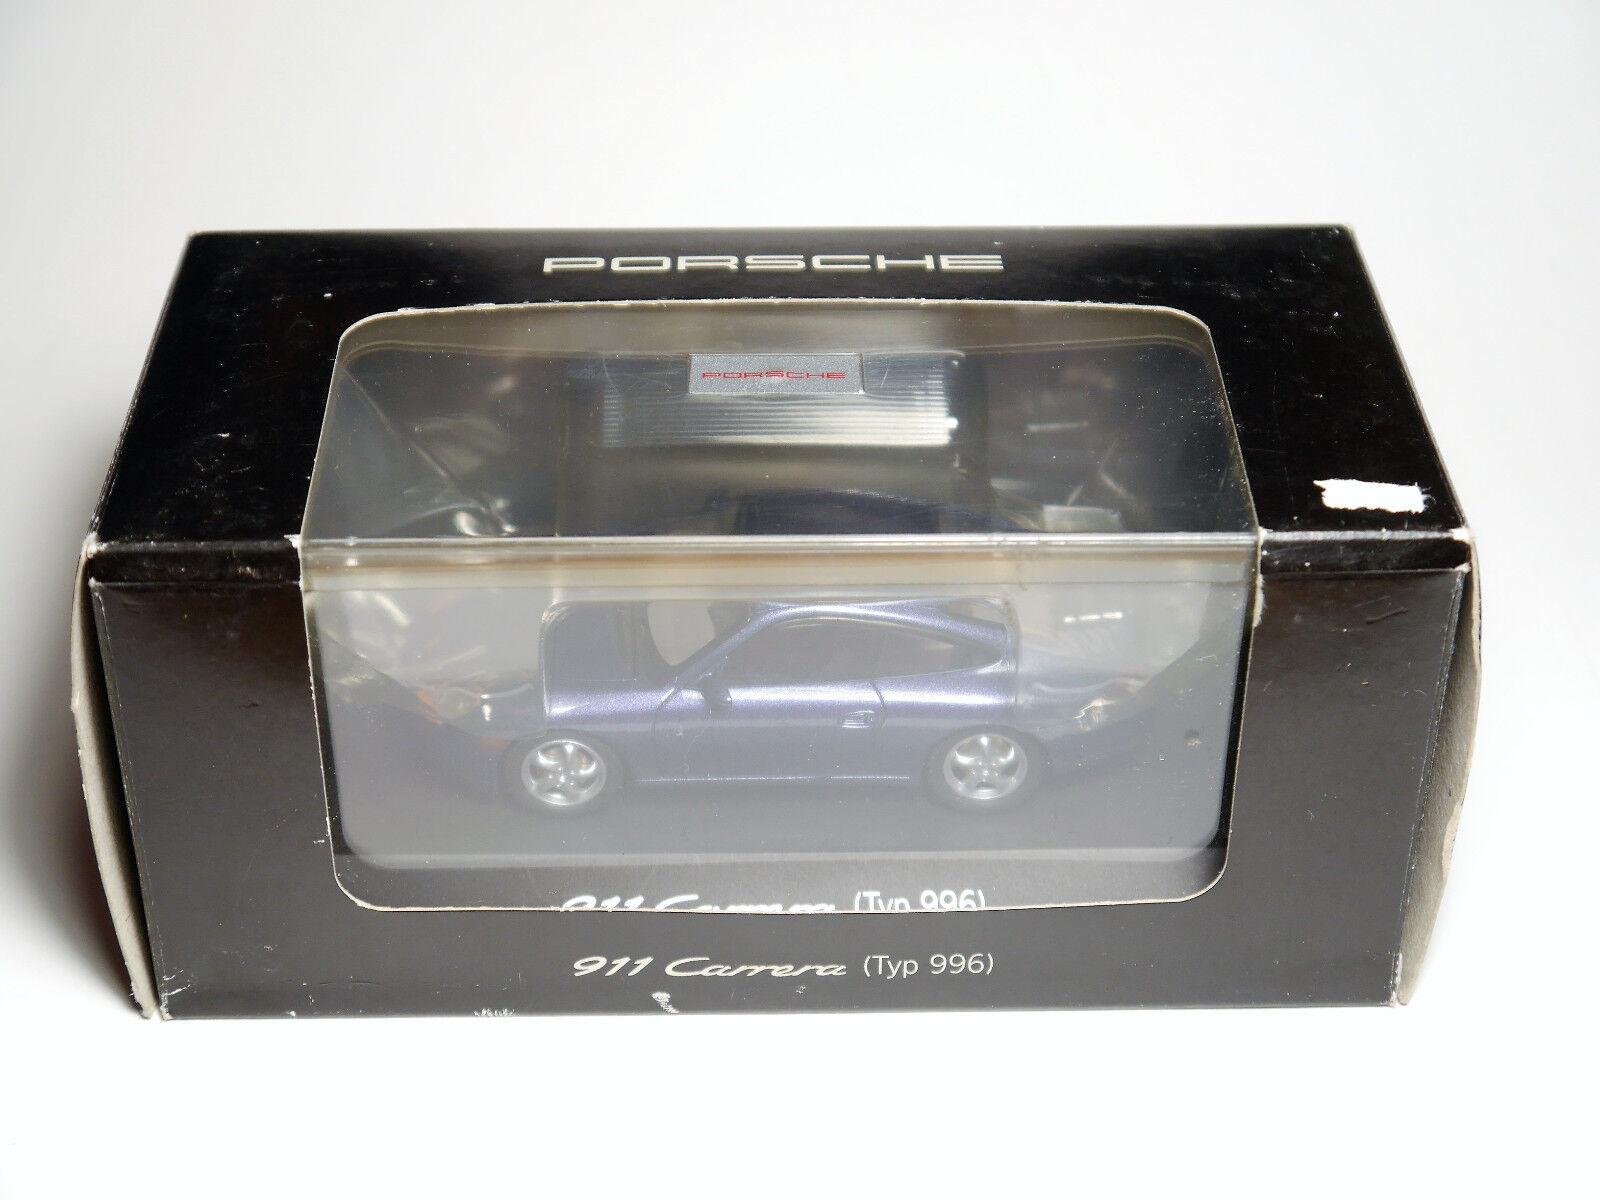 Porsche 911 996 Carrera Coupe bluee purple, Schuco WAP 020 049 97 1 43 Boxed